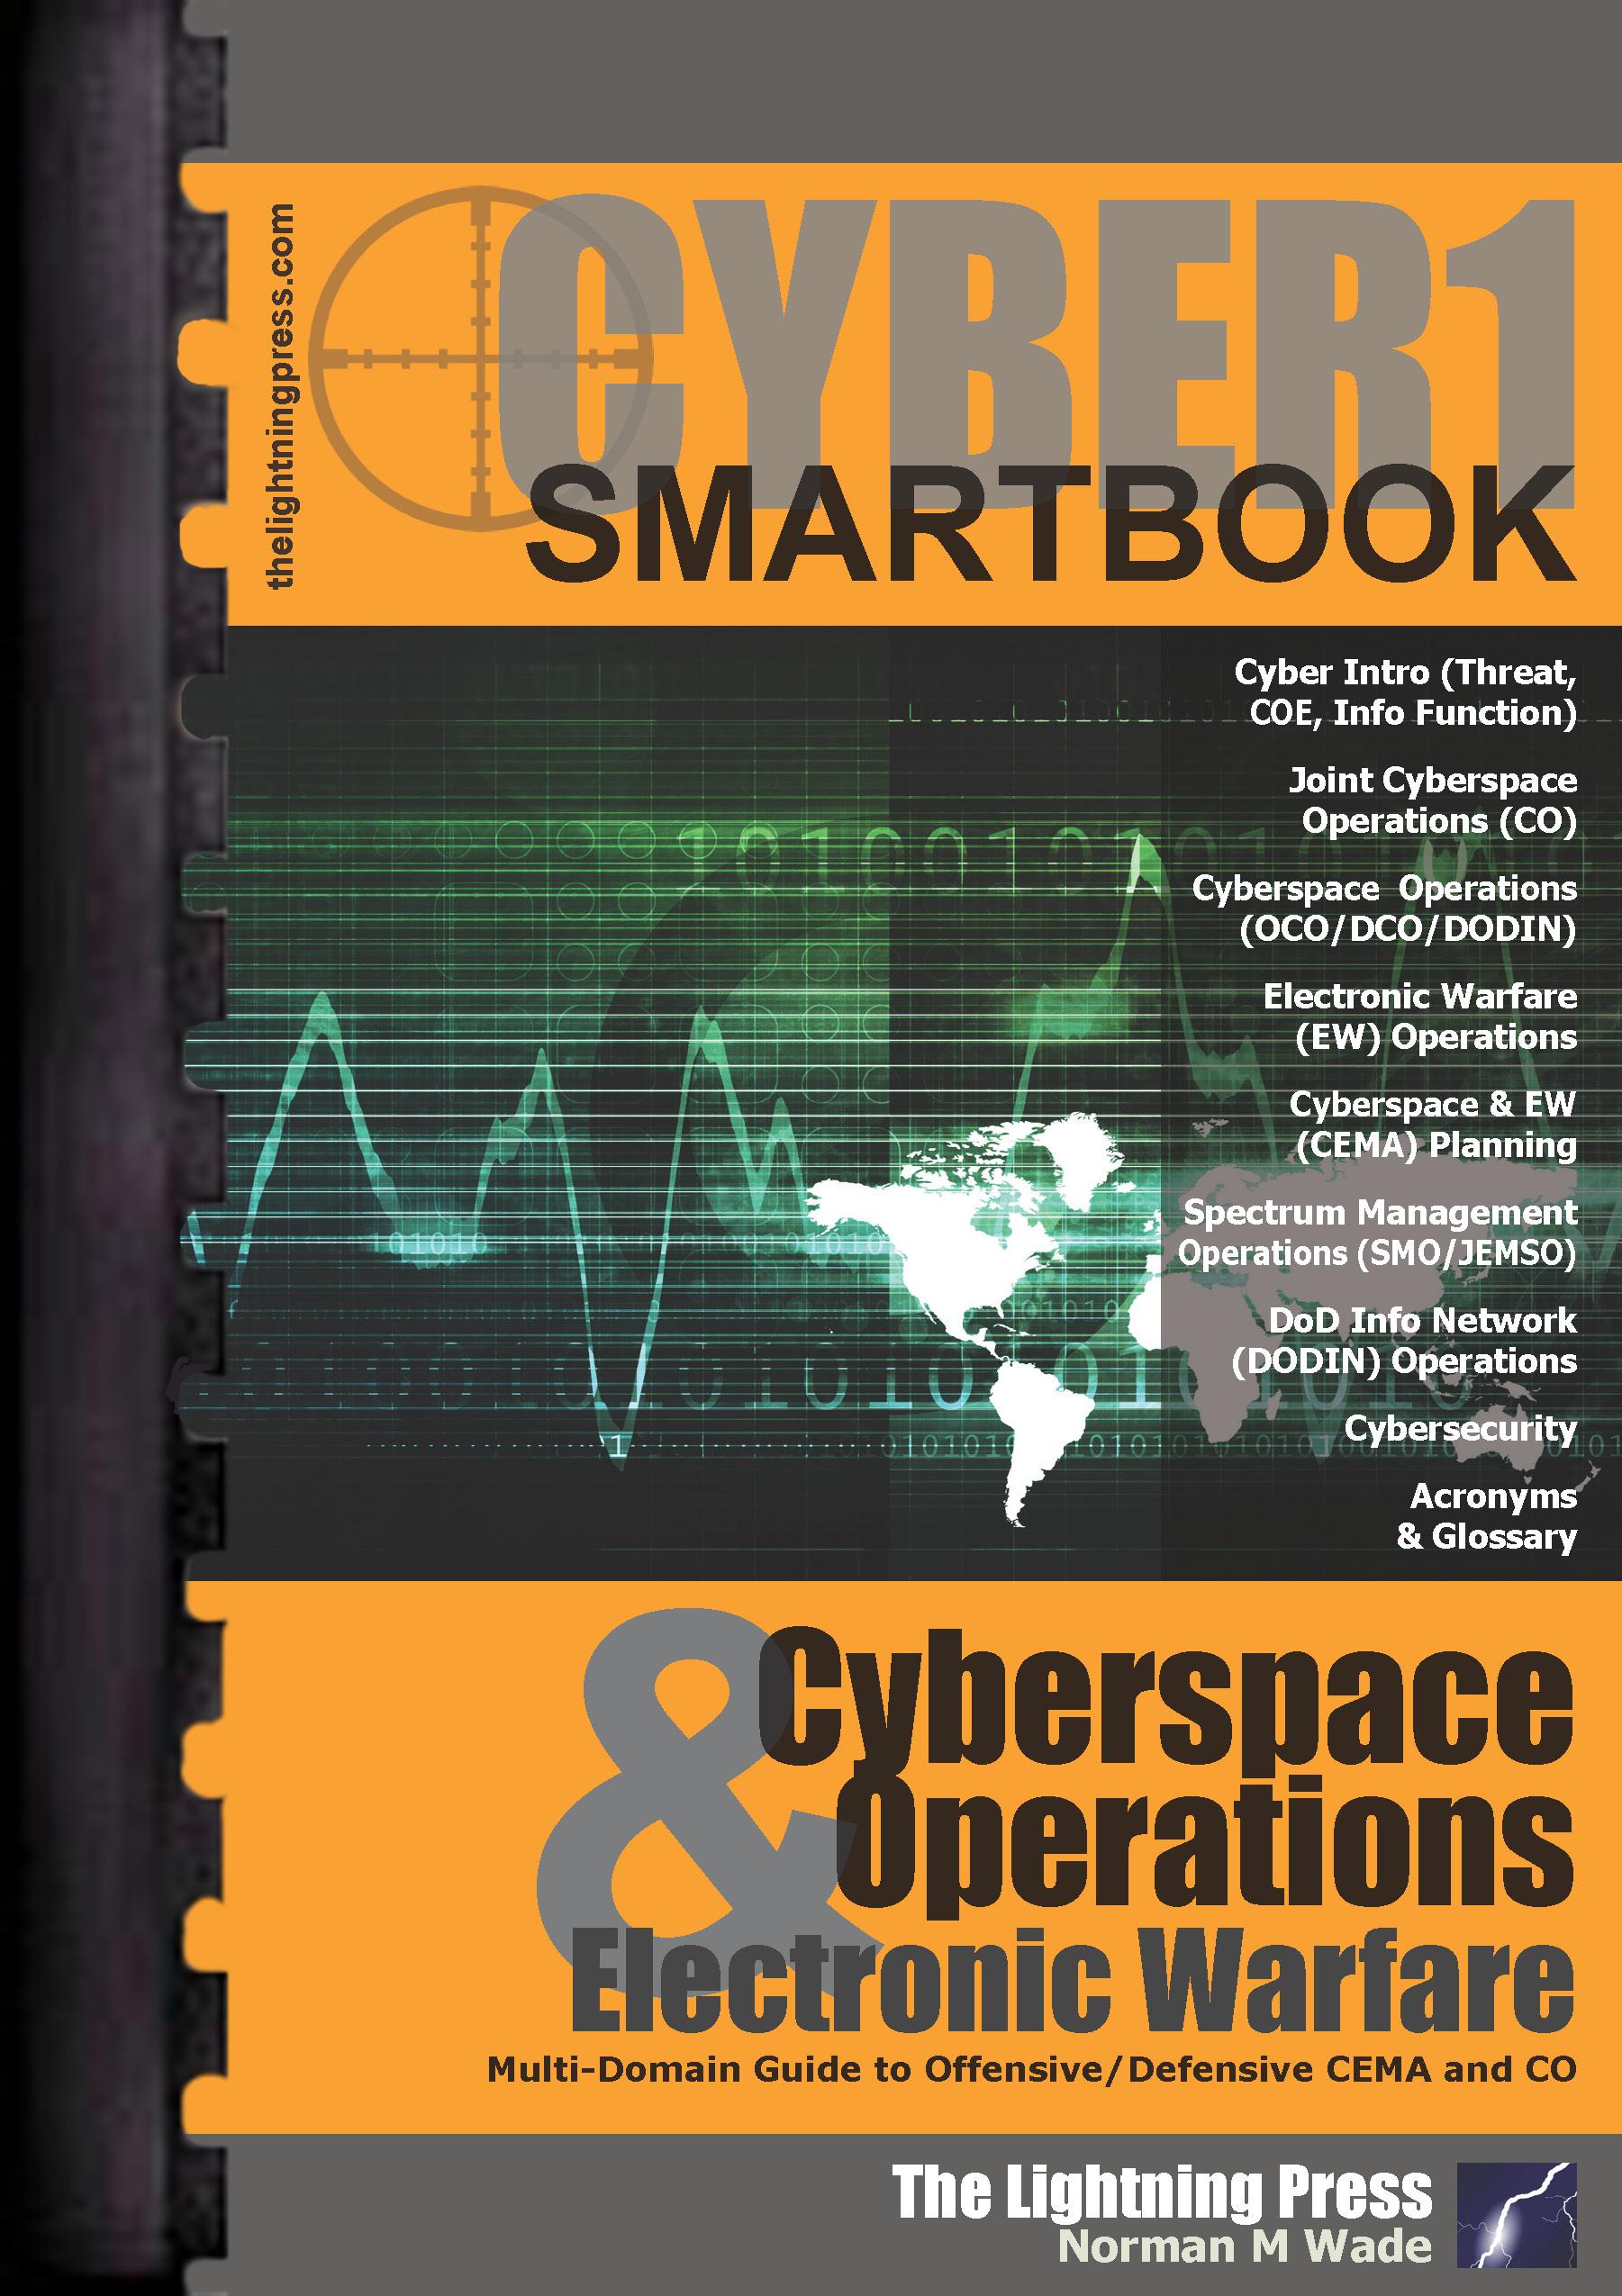 CYBER1: The Cyberspace Operations & Electronic Warfare SMARTbook